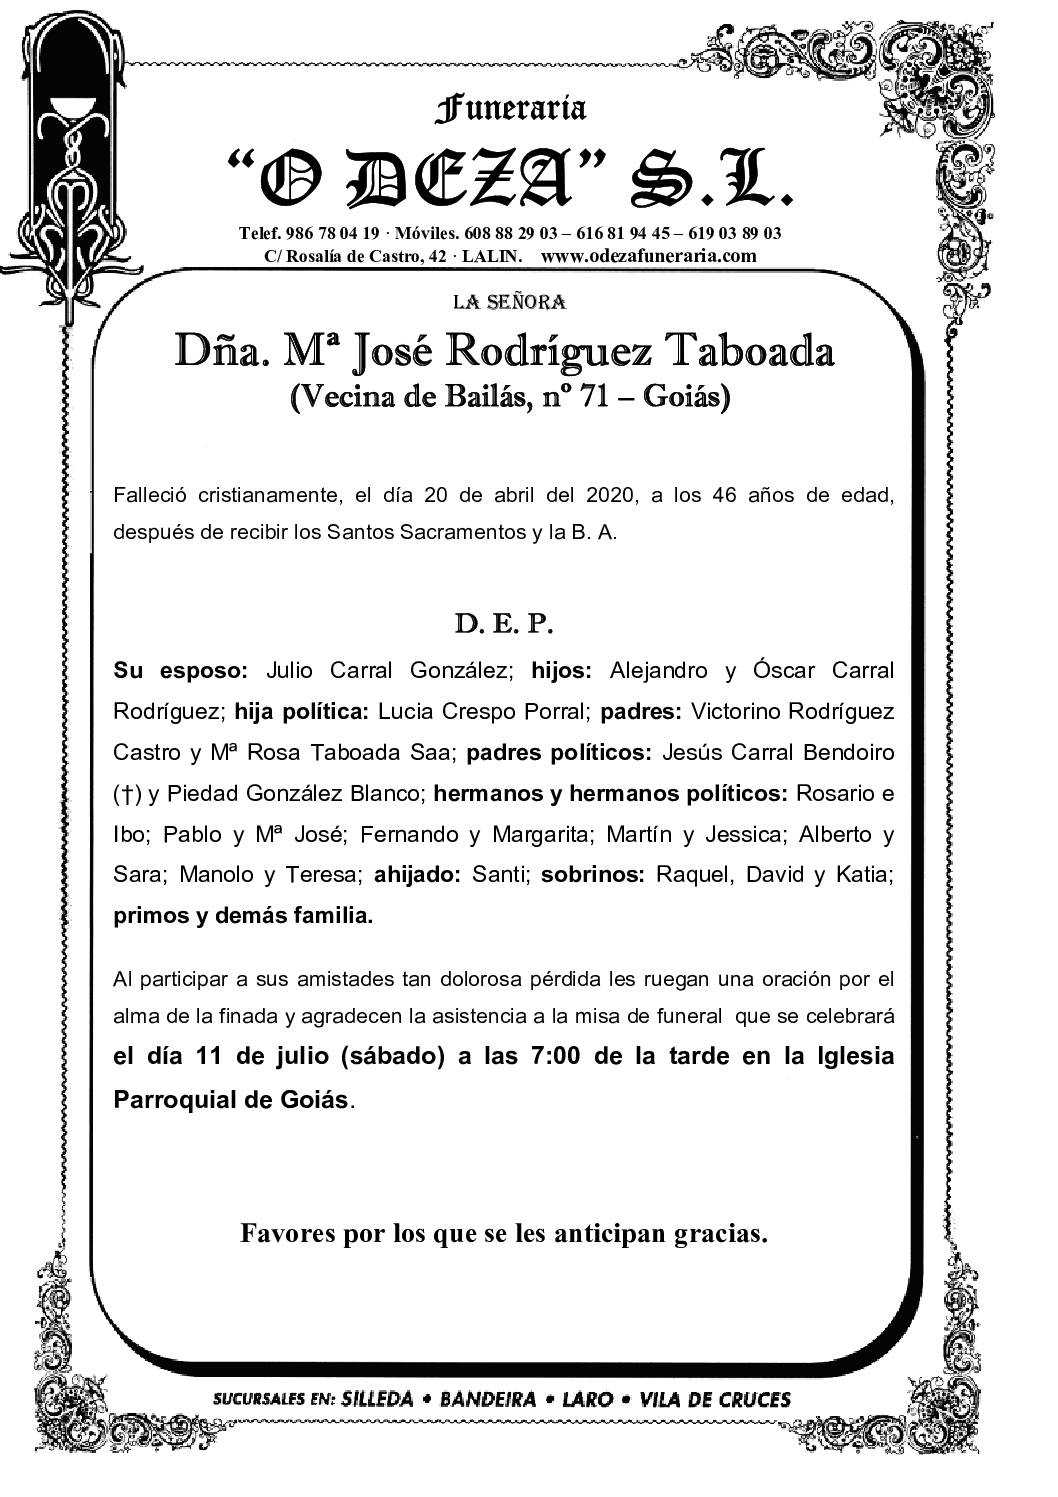 DÑA. Mª JOSÉ RODRIGUEZ TABOADA